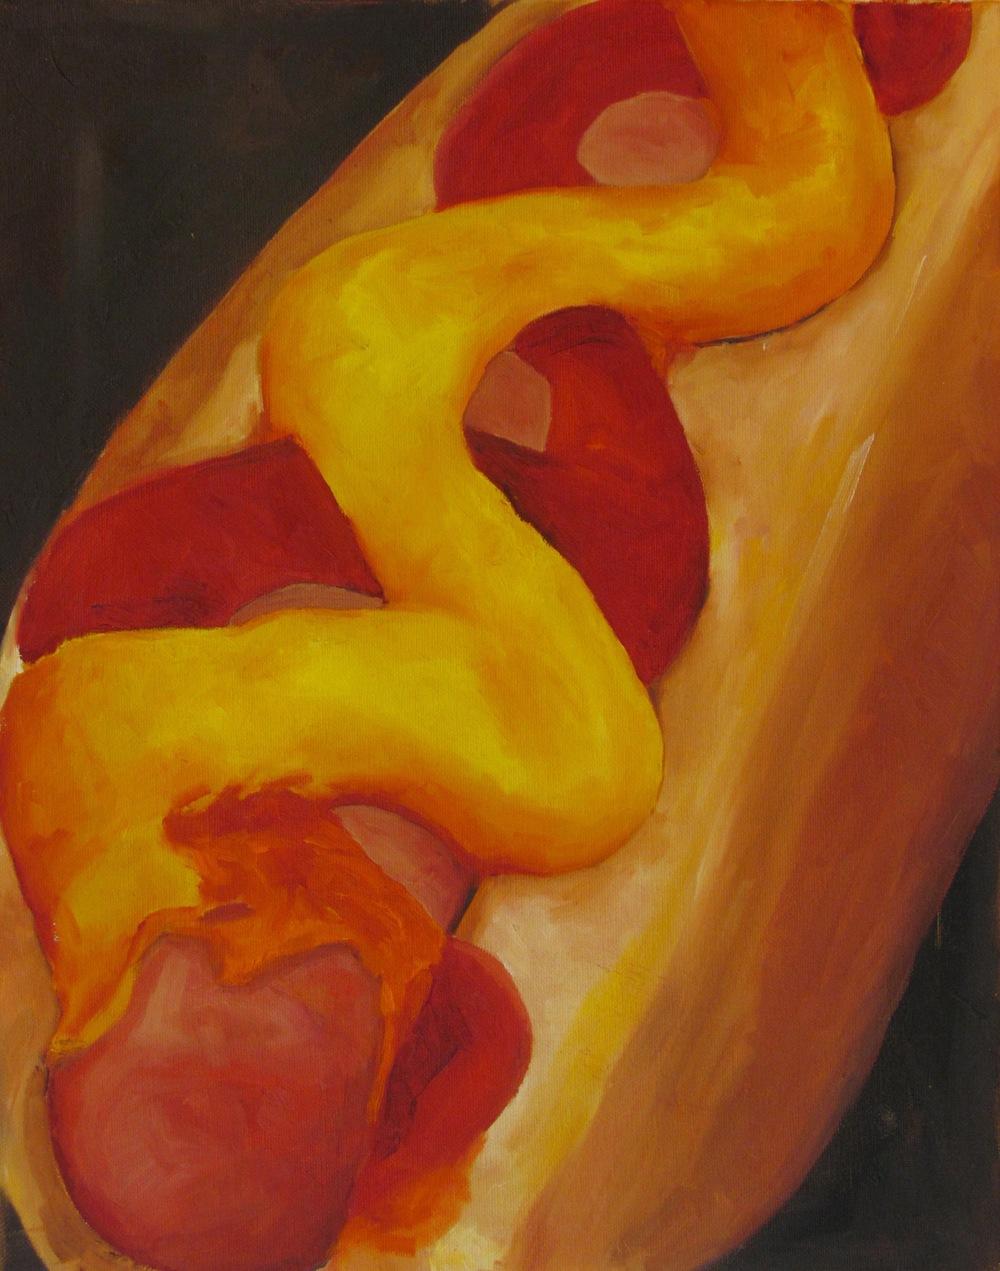 """Hot Dog"" by Shekinah Guab $500"